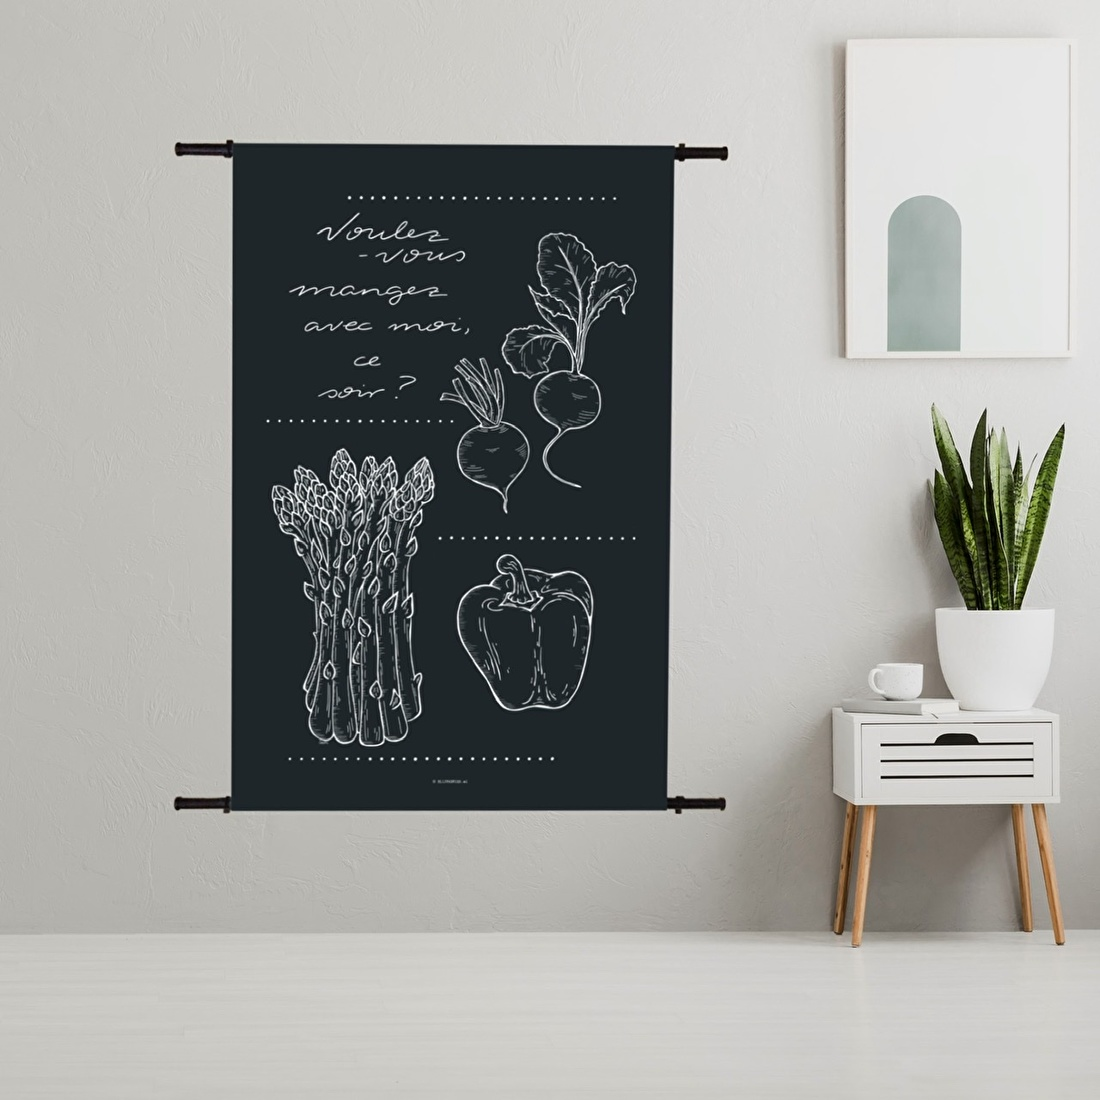 Kies formaat afmeting wandkleed wanddecoratie